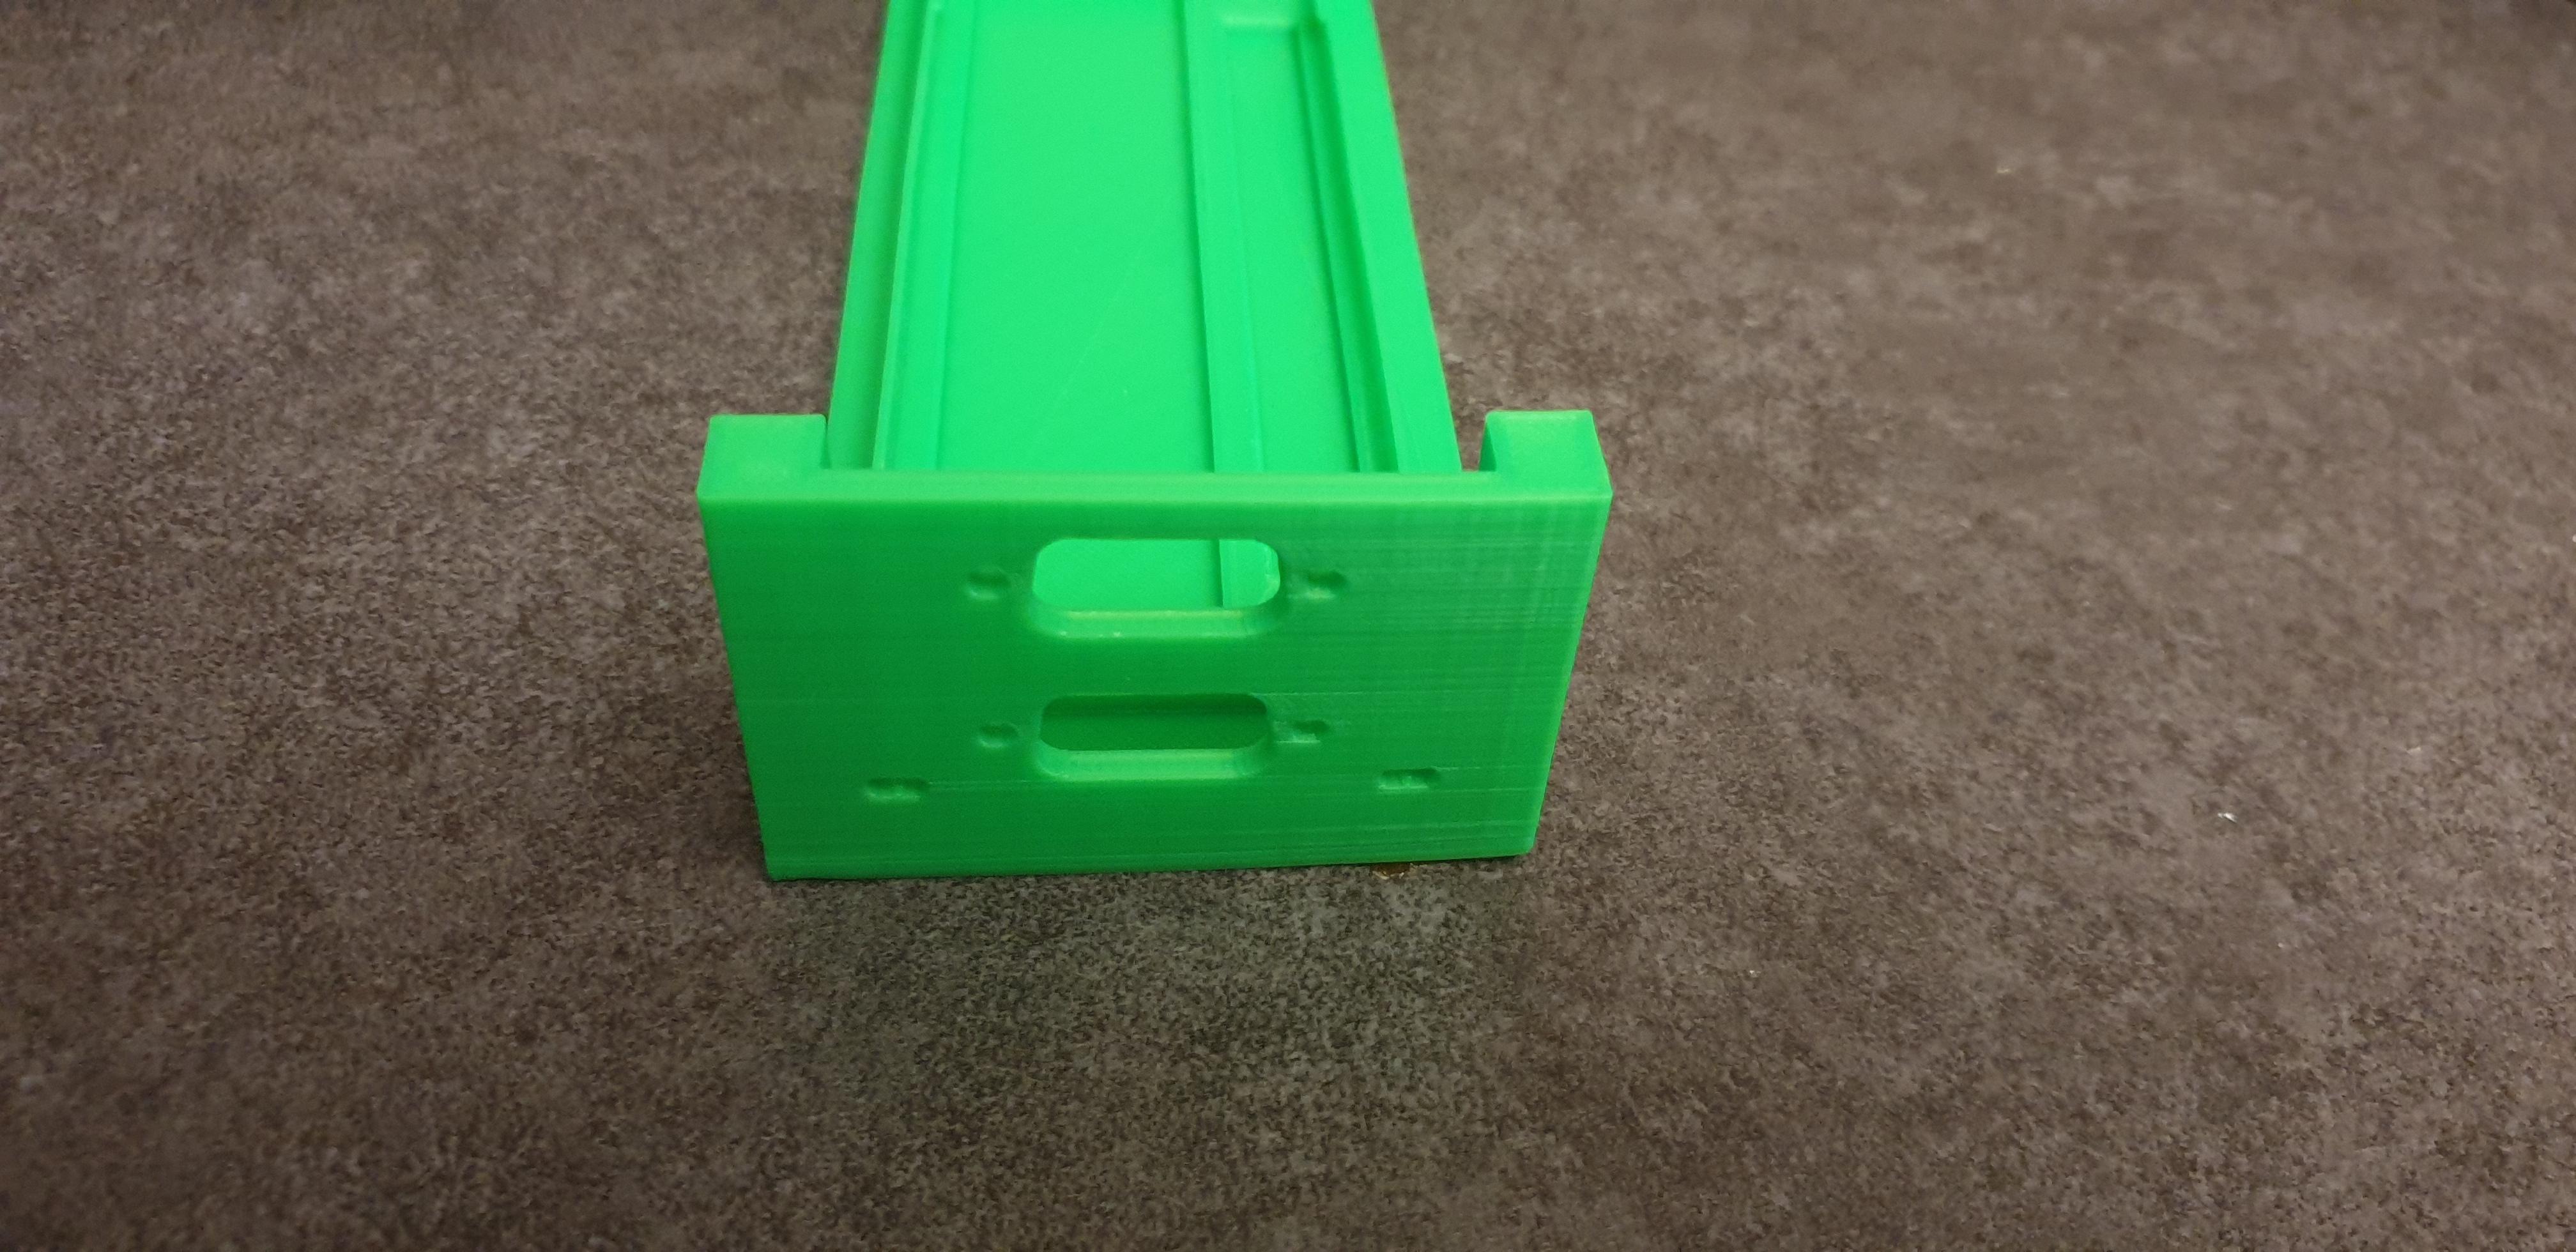 20200125_213246.jpg Download free STL file JVC RM-LP100 Tally Box (arduino optocoupler circuit box) • 3D printing model, CMH